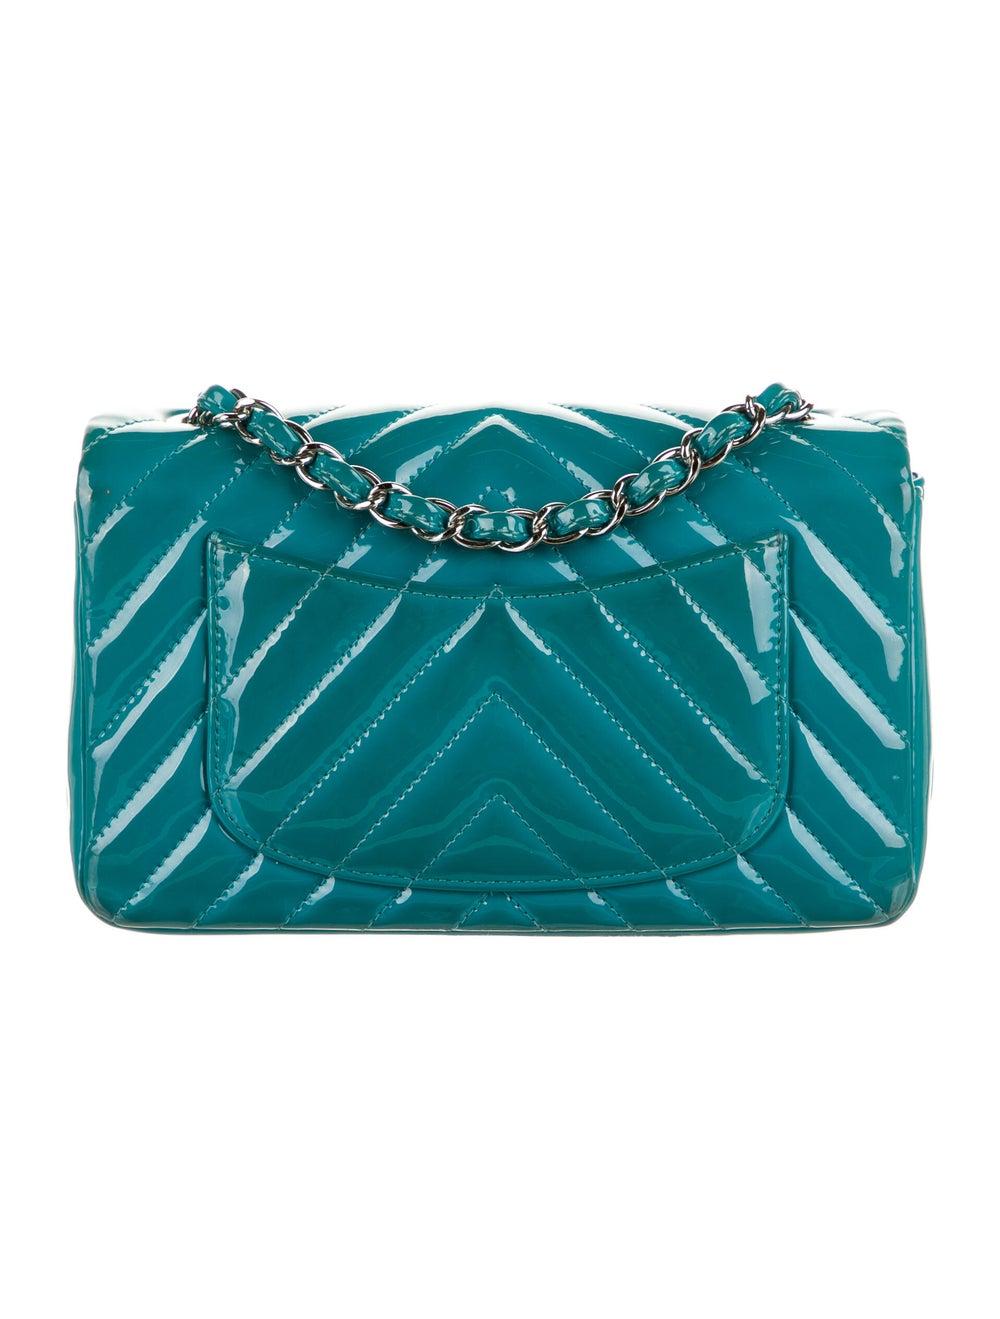 Chanel Classic New Mini Chevron Flap Bag Blue - image 4